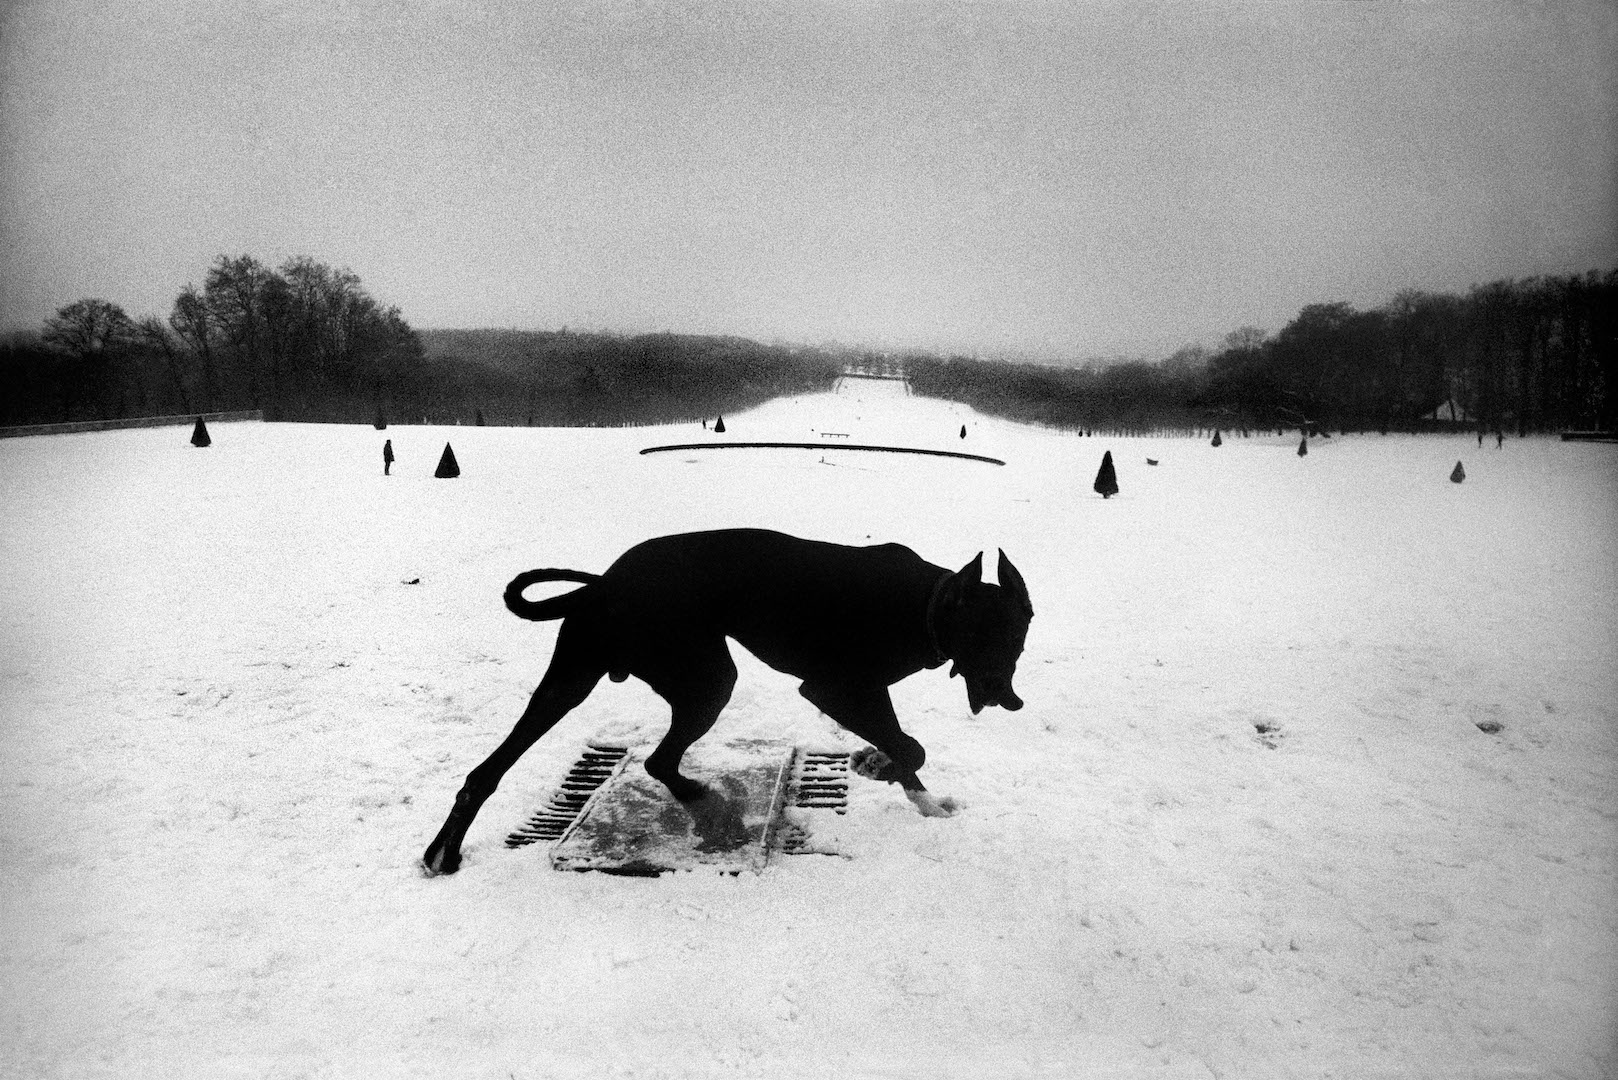 Josef Kuodelka: Franciaország, 1987<br />© Josef Koudelka / Magnum Photos © Centre Pompidou